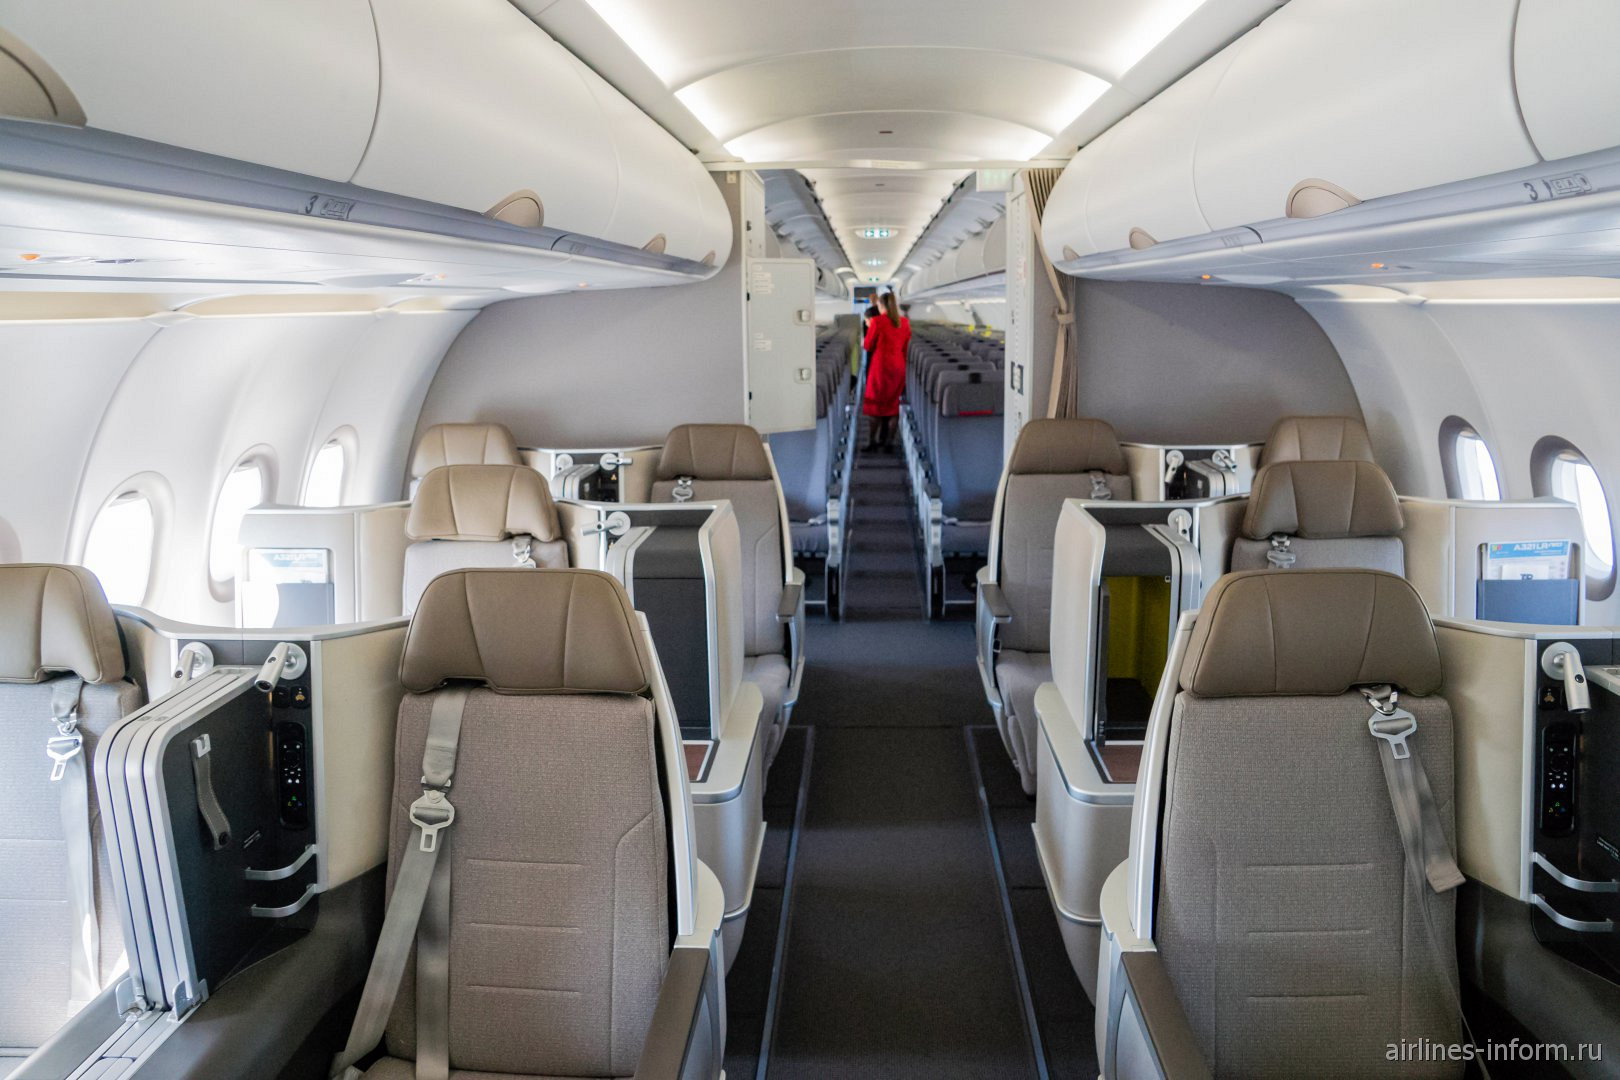 Пассажирский салон самолета Airbus A321LR авиакомпании TAP Portugal